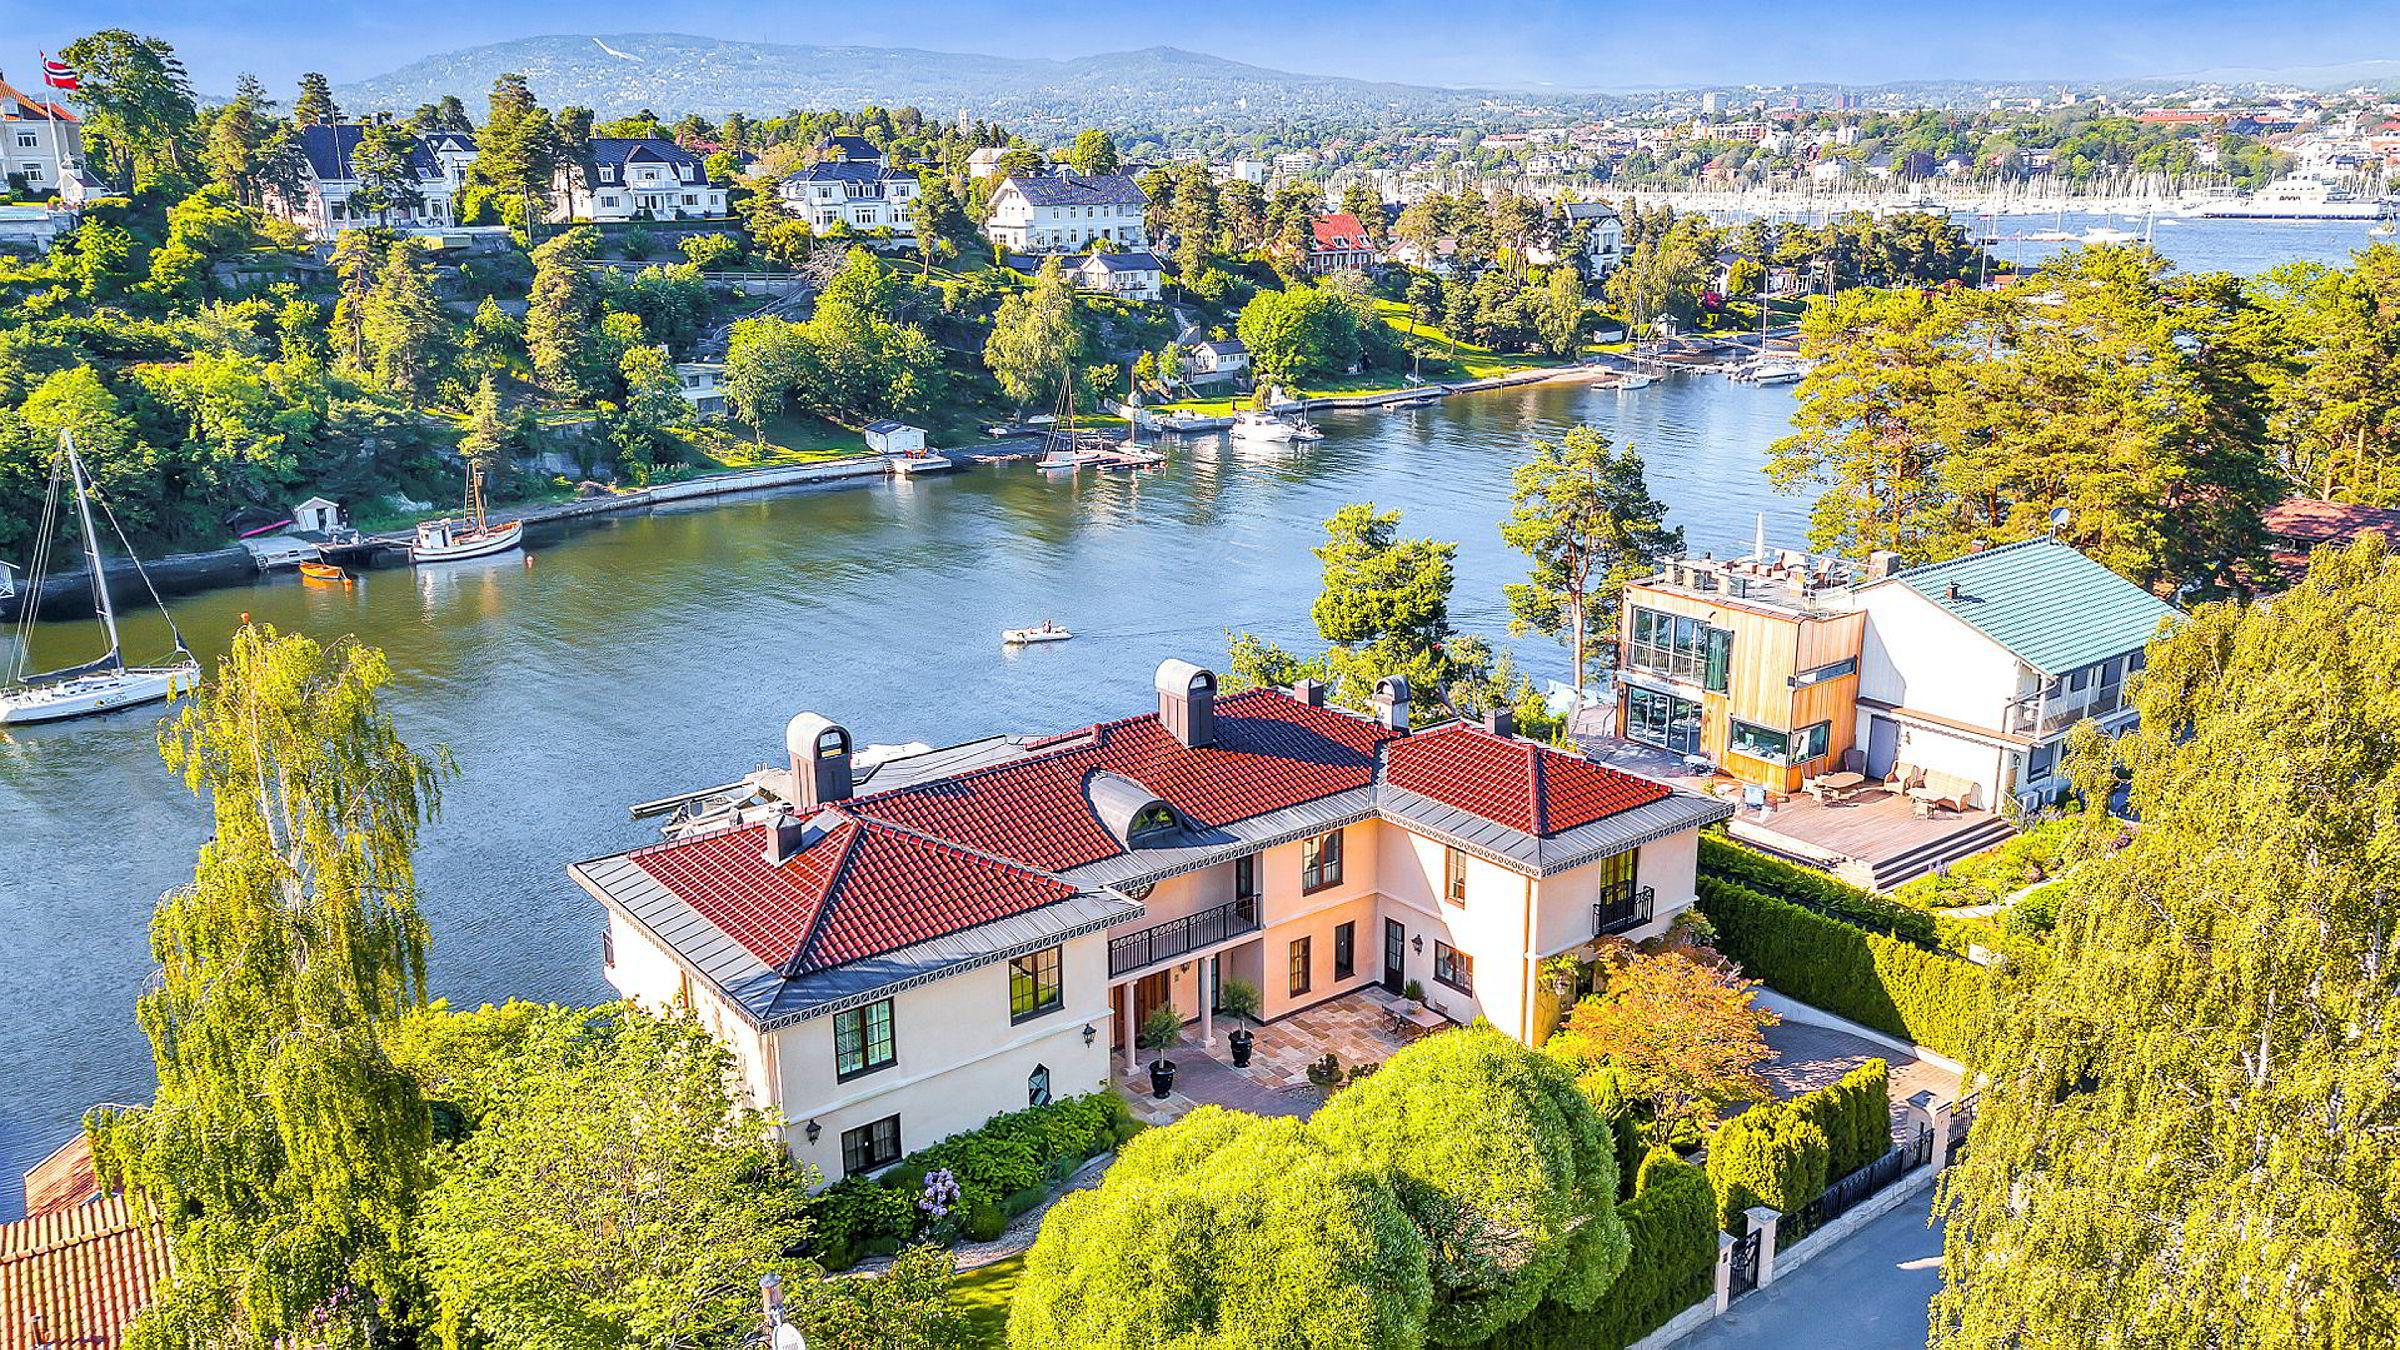 Opprinnelig ville XXL-gründer Øivind Tidemandsen ha 80 millioner kroner for villaen på Bygdøy. Prisen endte på 68 millioner.